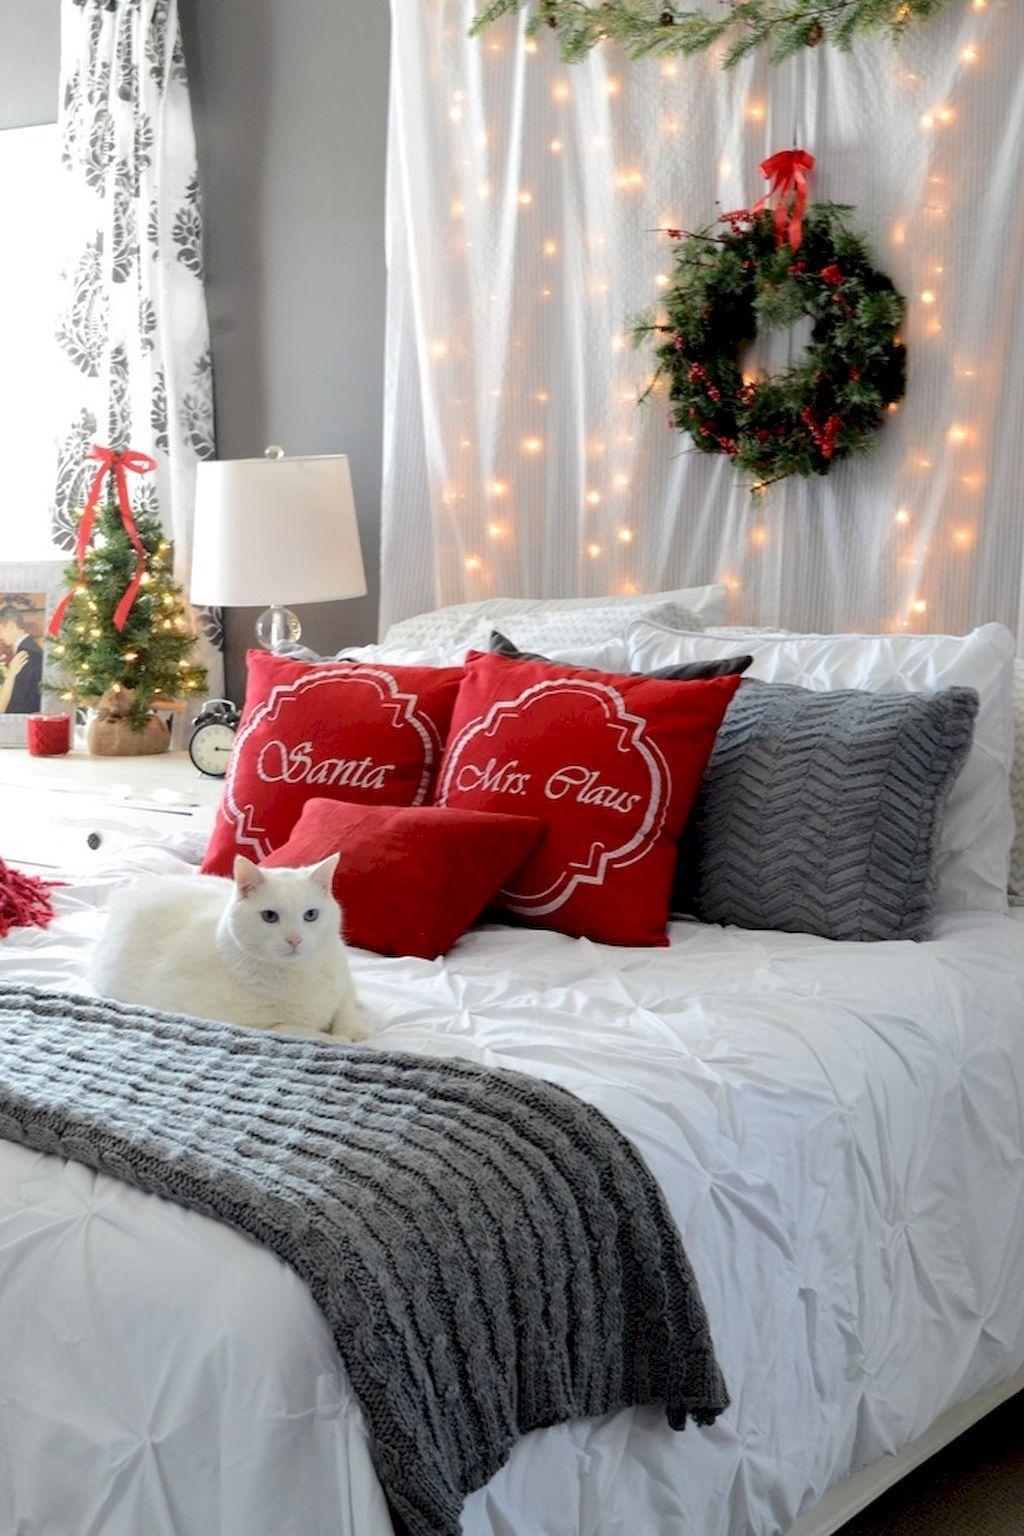 stunning minimalist christmas bedroom decorating ideas 38 rh pinterest com Log Cabin Night Cabin the Woods Decorated in Christmas